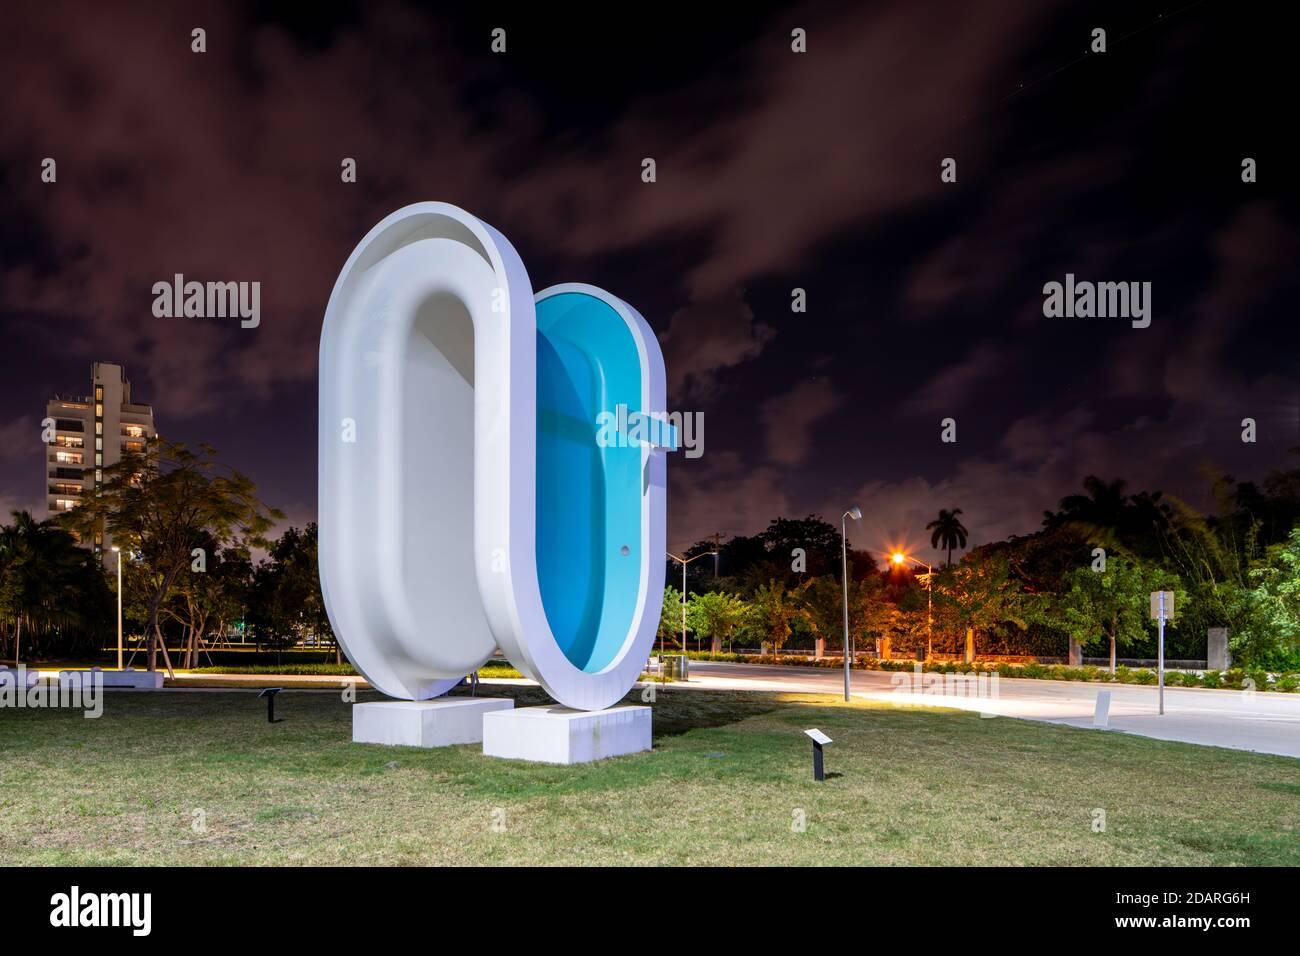 MIAMI BEACH, FL, USA - NOVEMBER 13, 2020: Bent shape swimming pool at at Convention Center Park Miami Beach FL Stock Photo